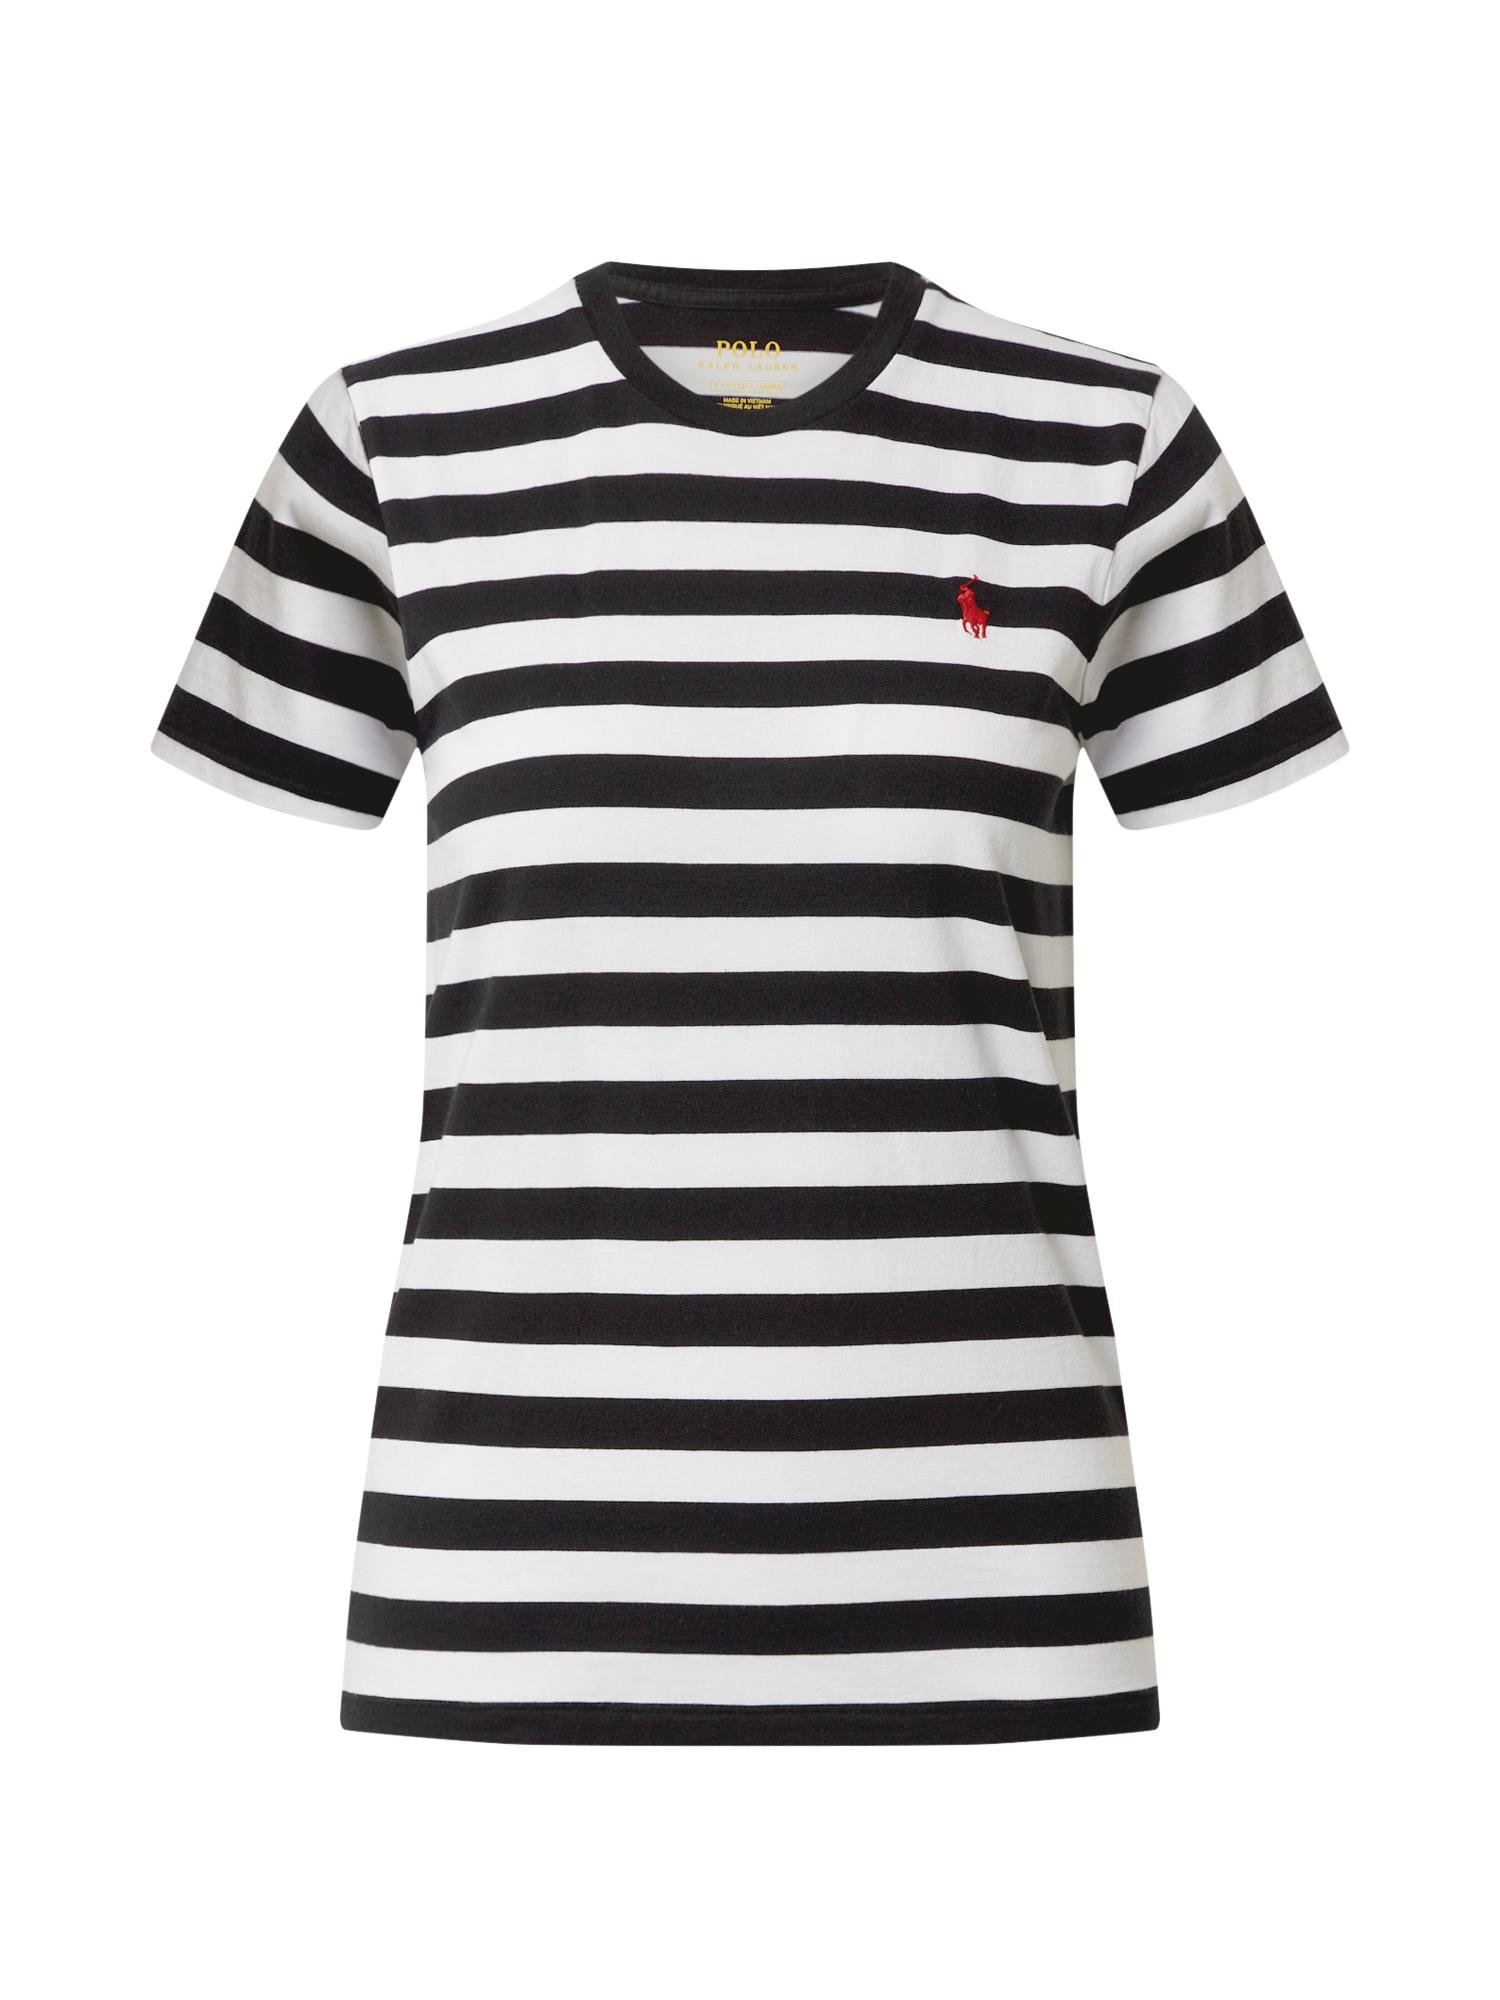 POLO RALPH LAUREN Póló  fehér / fekete / piros